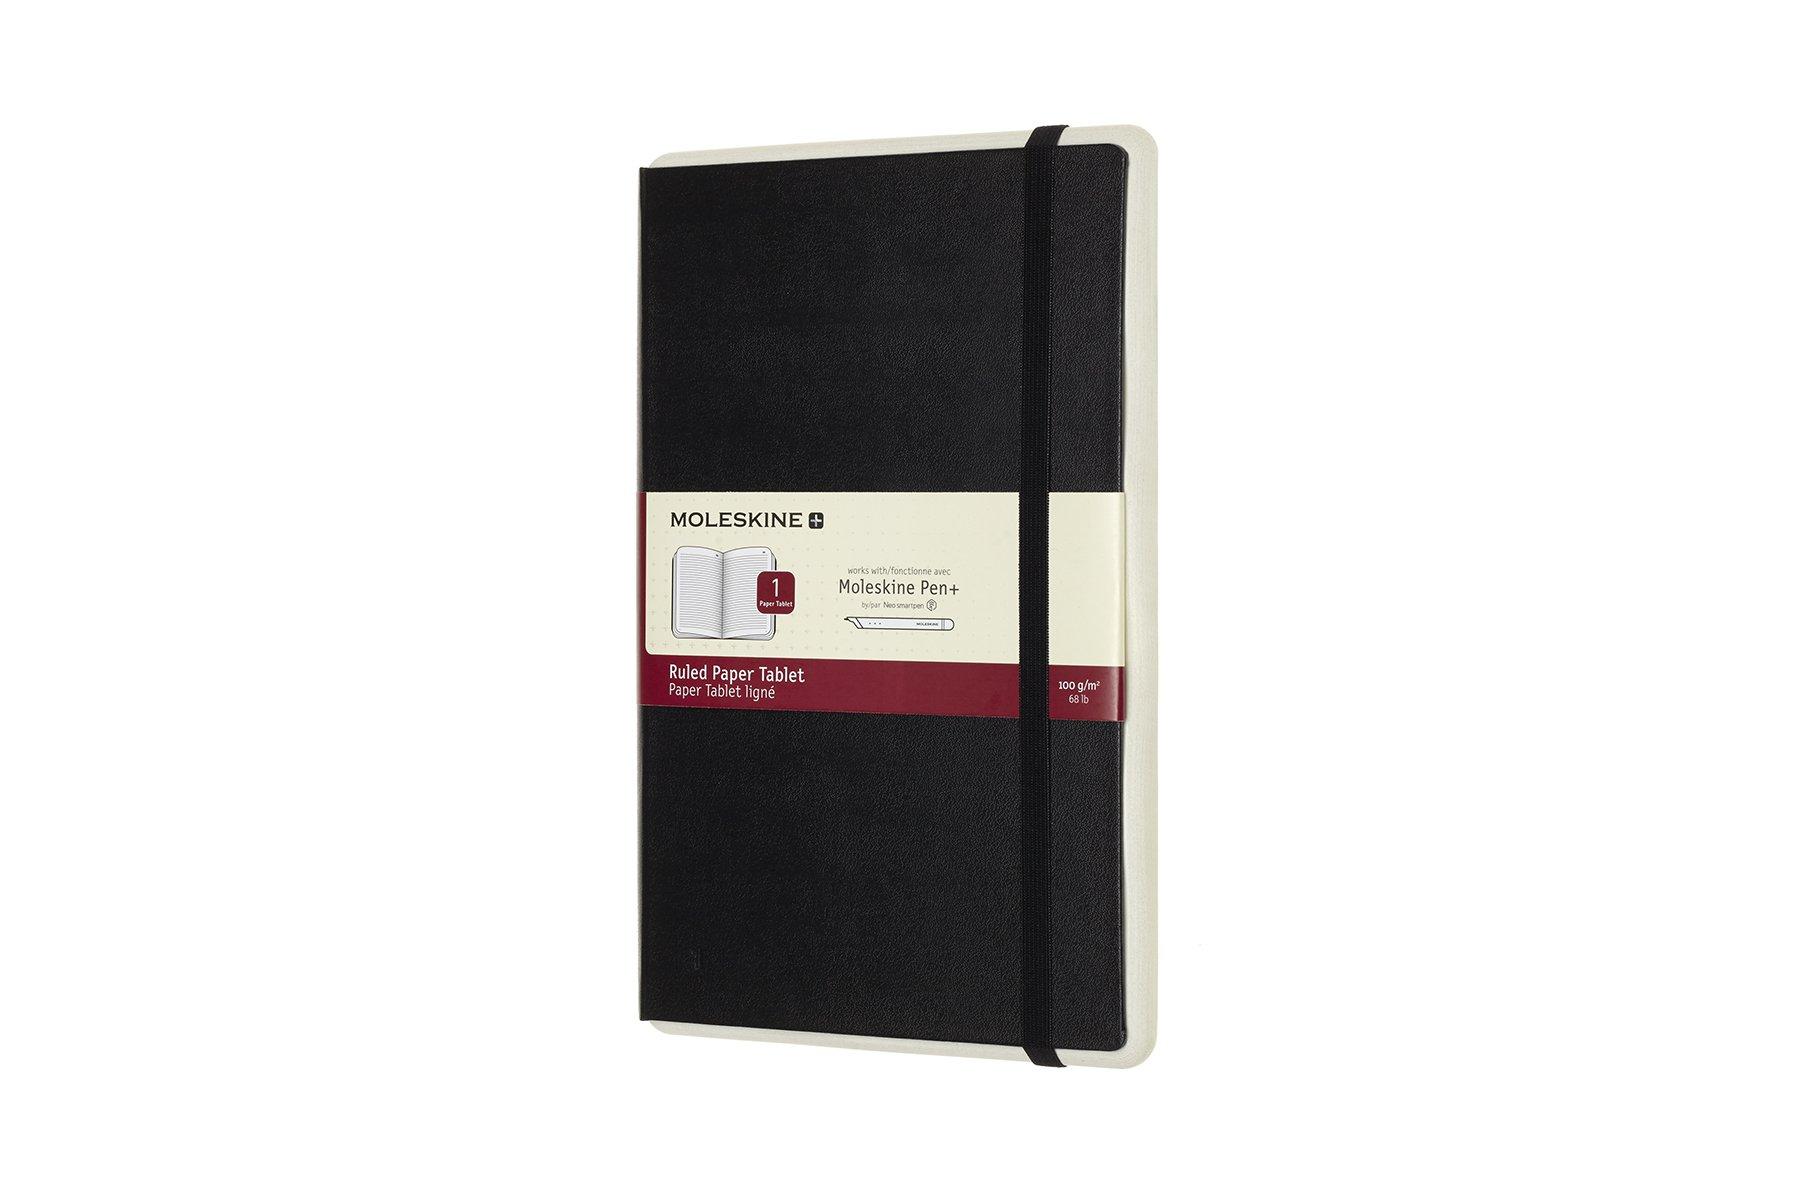 Moleskine Paper Tablet Hard Cover Smart Notebook, Ruled,...